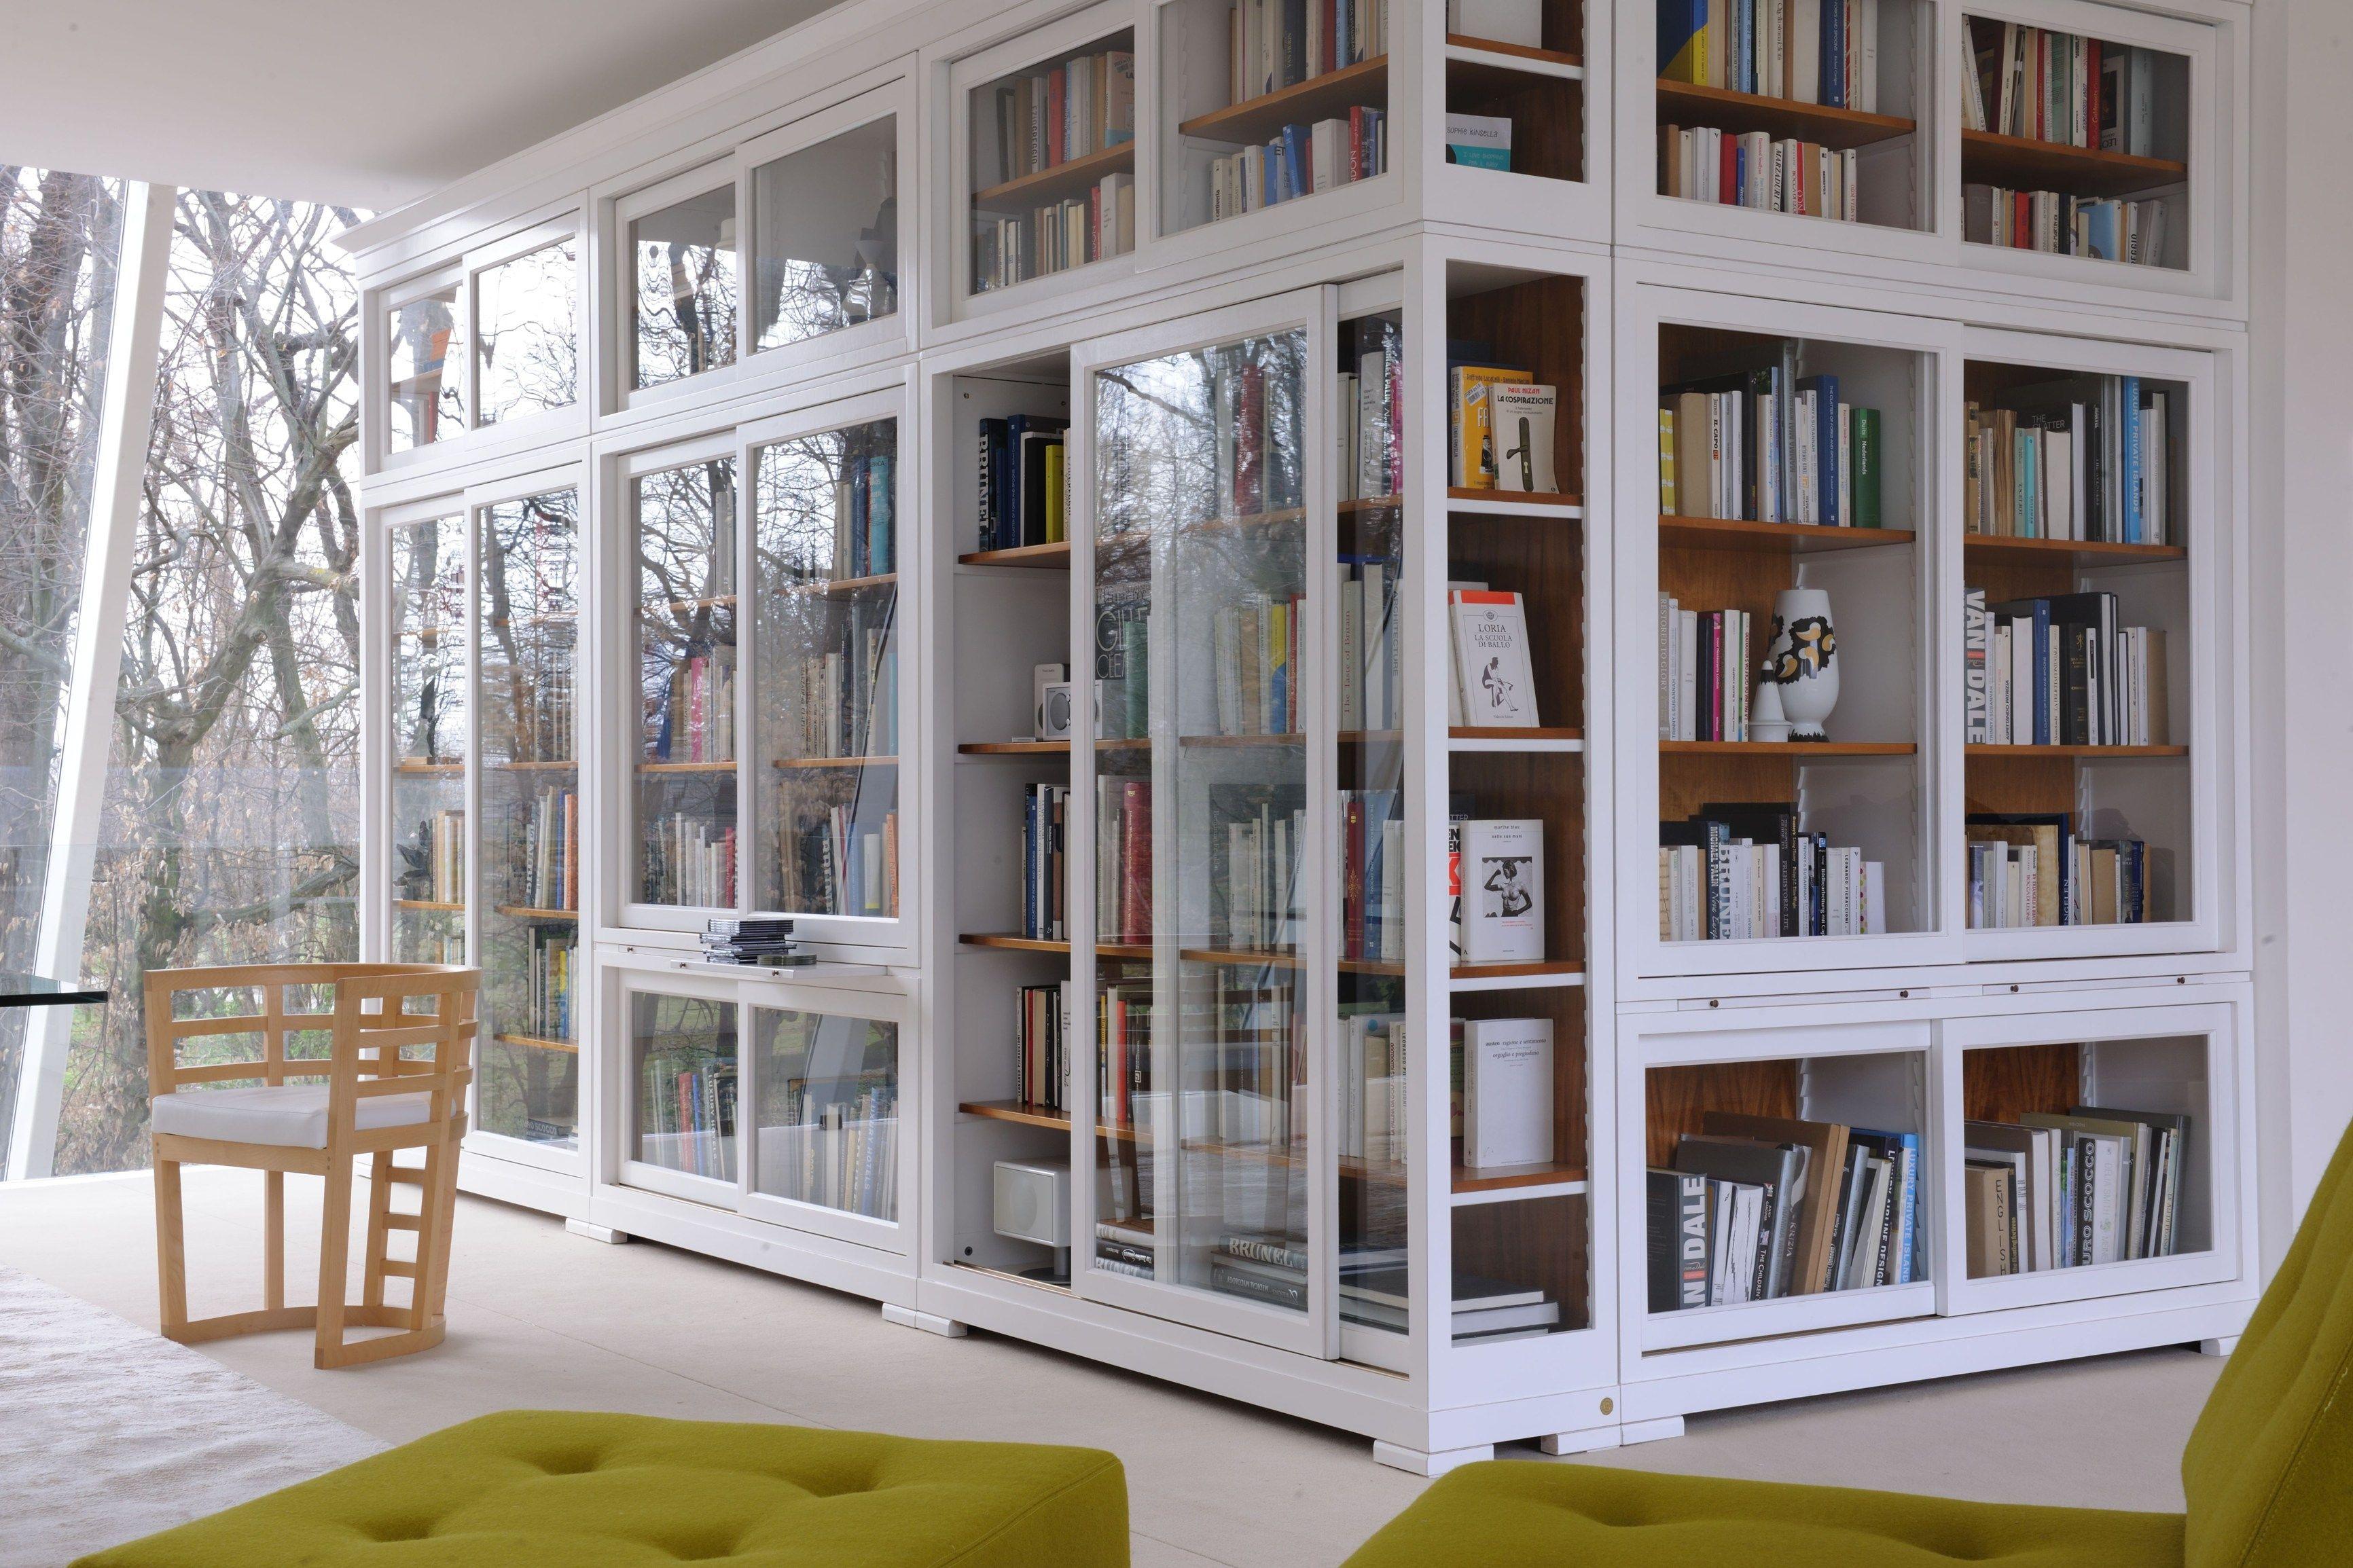 modulo biedermeier libreria by morelato design centro